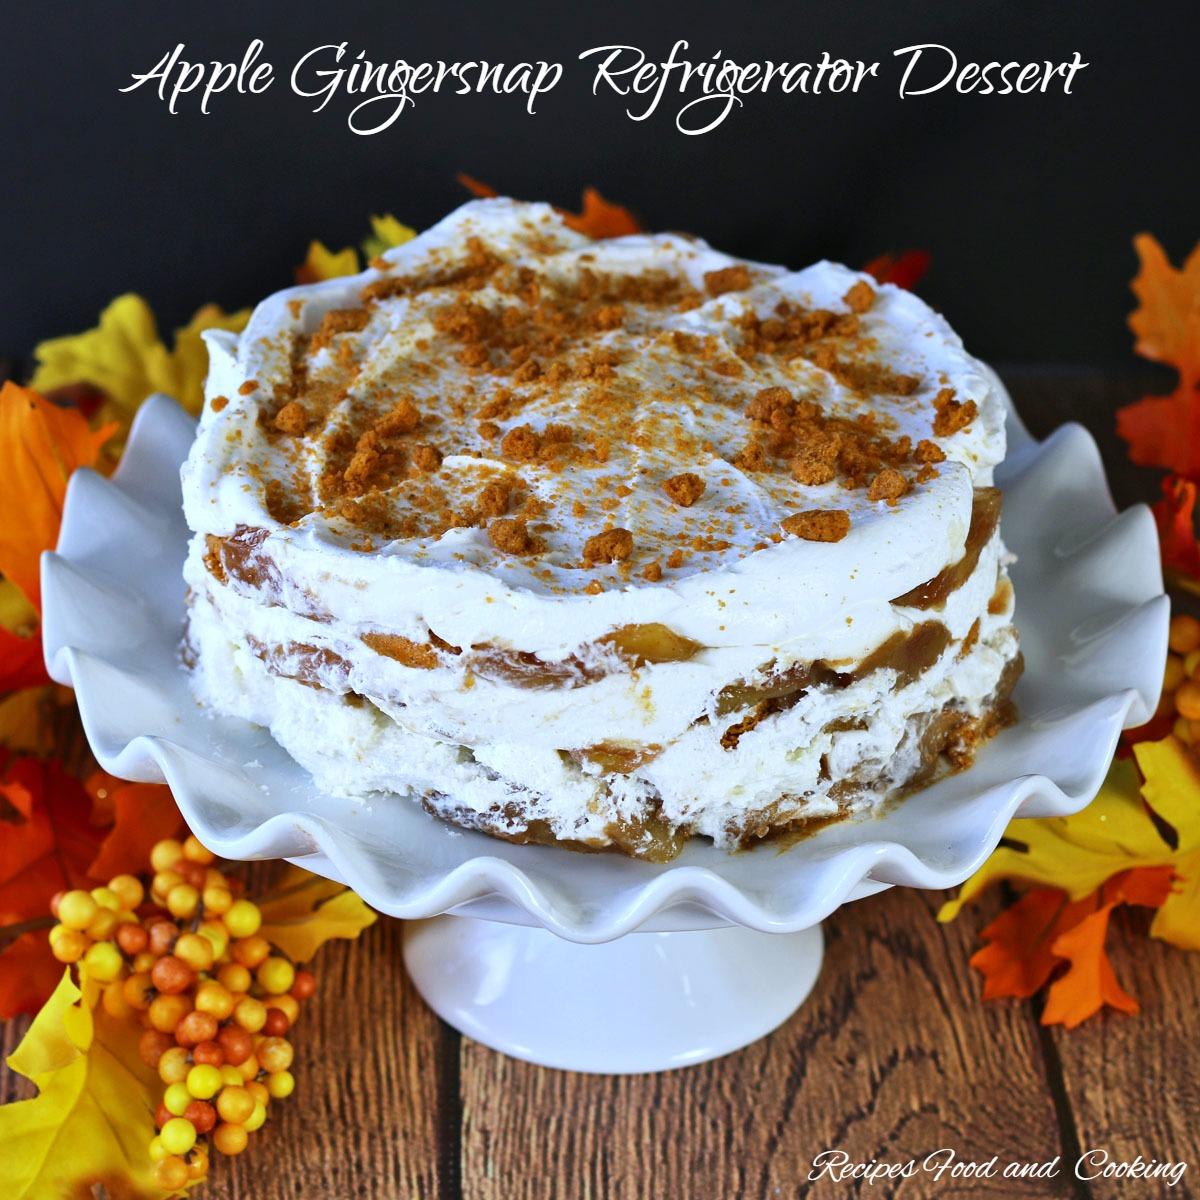 Apple Gingersnap Refrigerator Dessert #SundaySupper